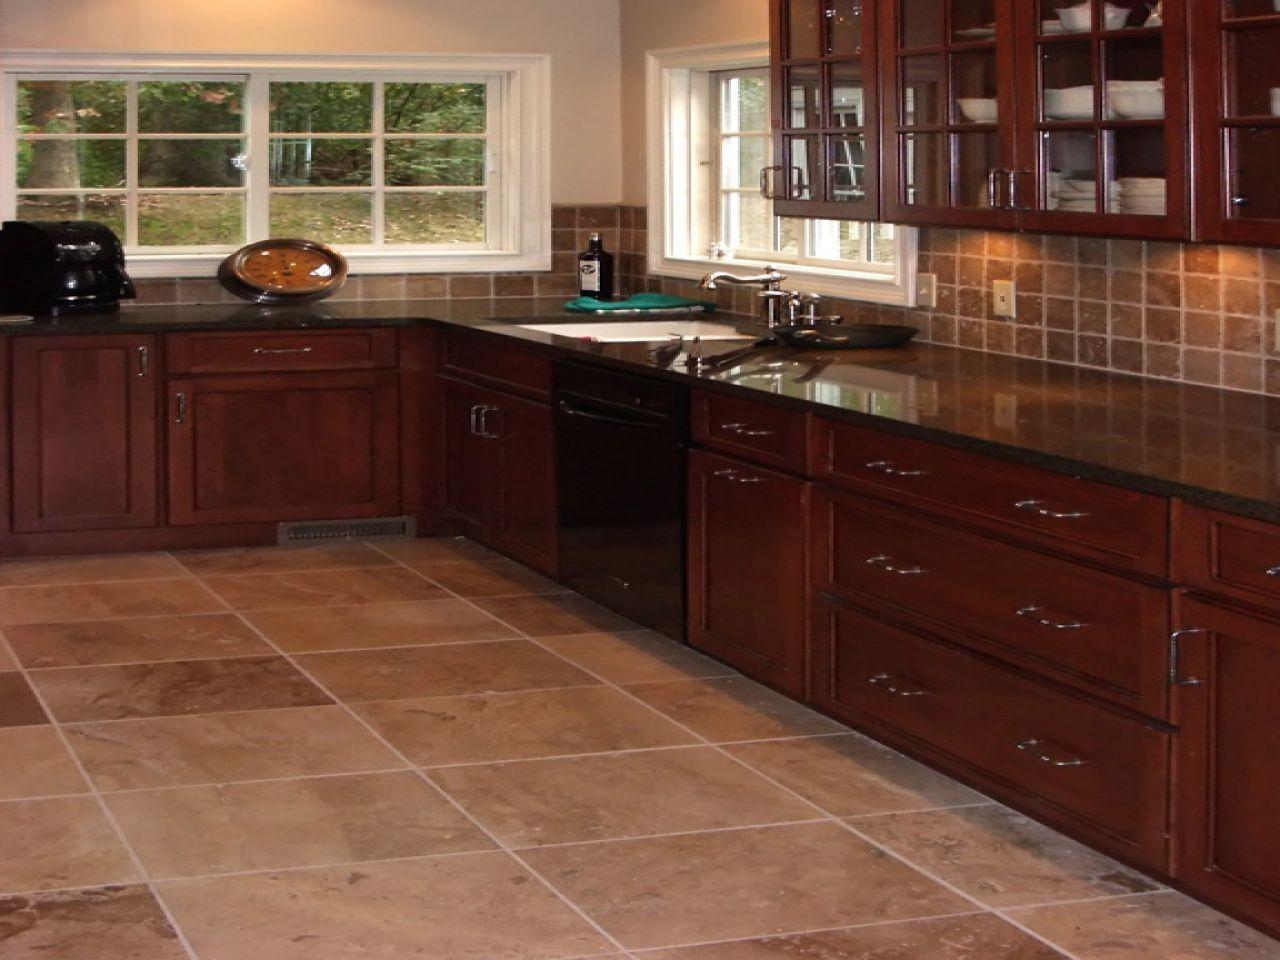 Cherry Cabinets With Stone Linoleum Flooring Cherry Kitchen Cabinets Kitchens With Grey Cherry Cabinets Kitchen Kitchen Floor Tile Travertine Kitchen Floors